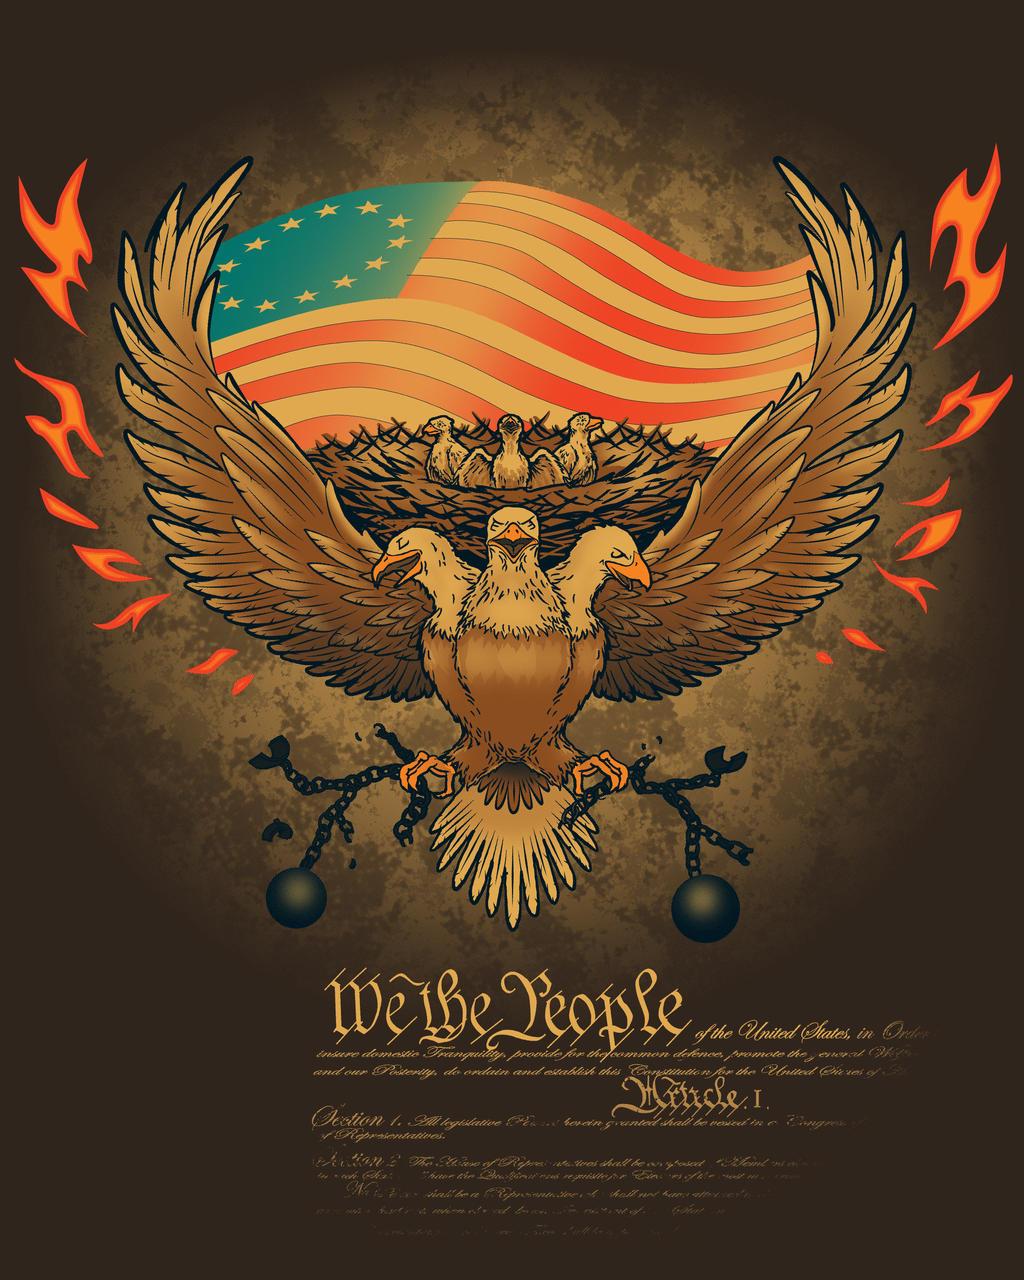 American Ideals by paxdomino on DeviantArt